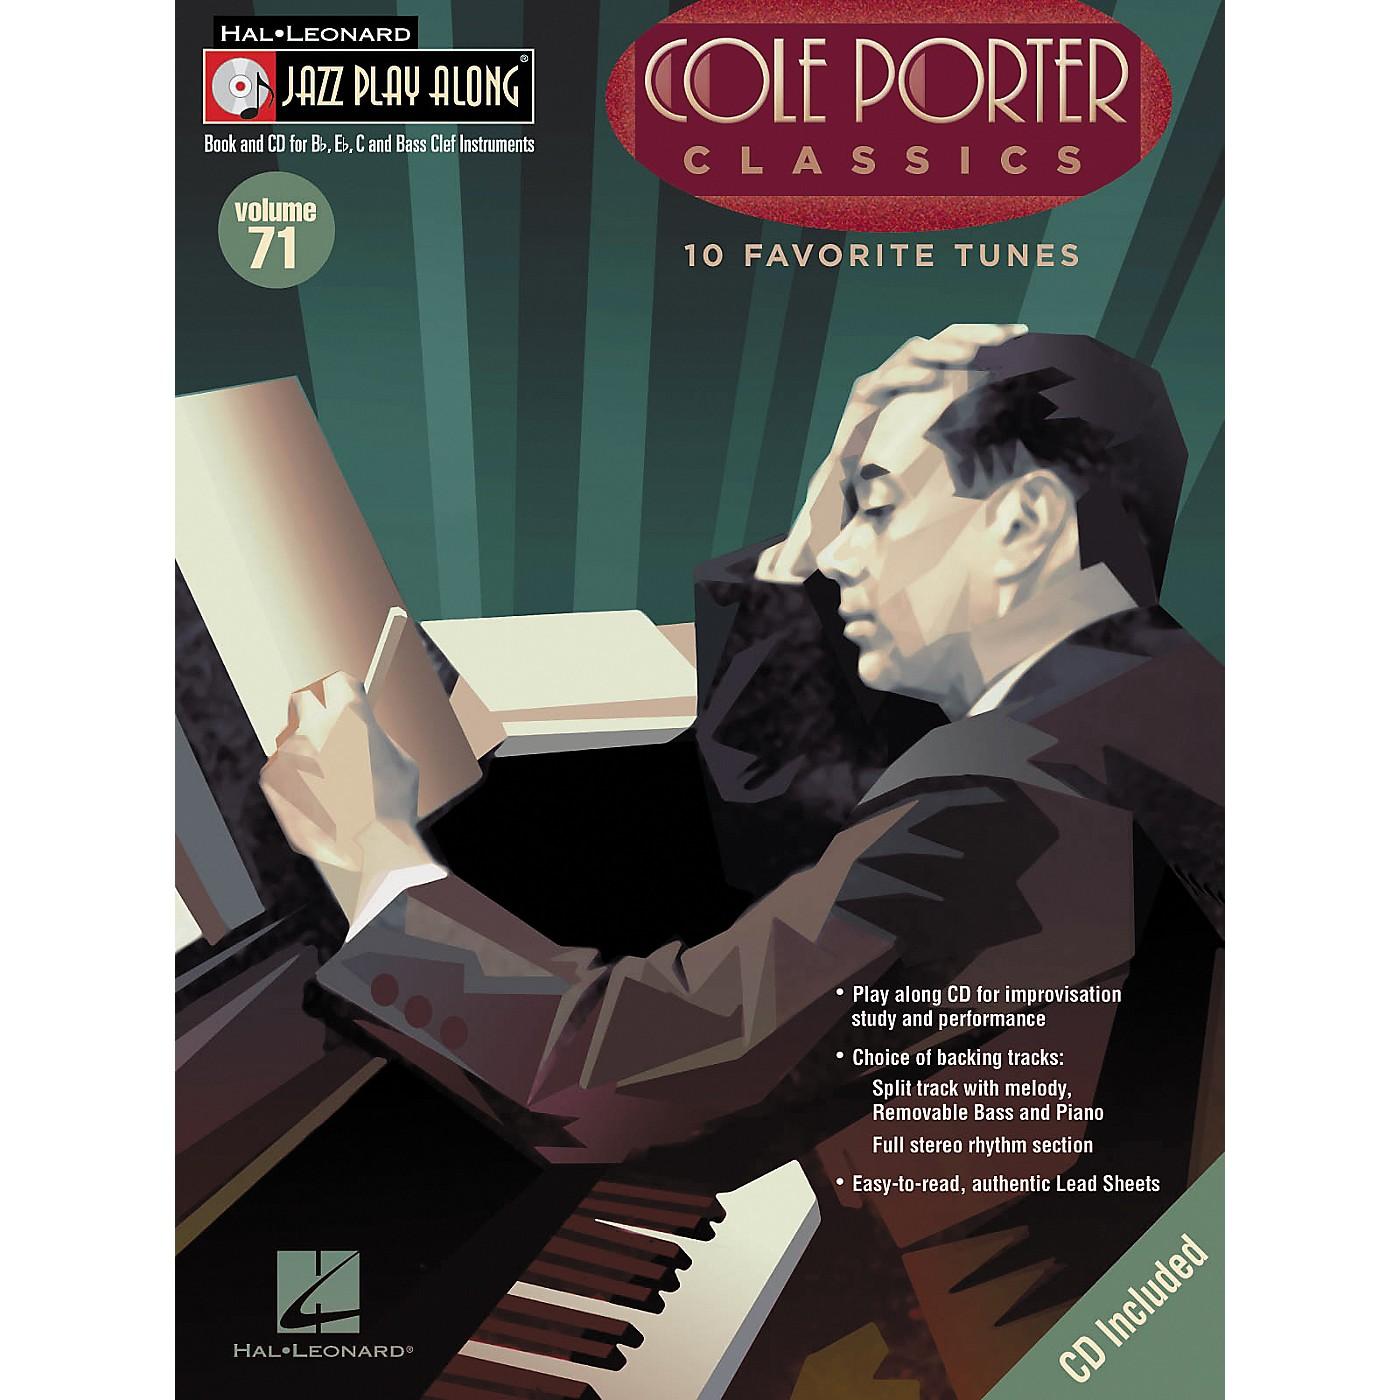 Hal Leonard Cole Porter Classics - Jazz Play Along Volume 71 Book with CD thumbnail